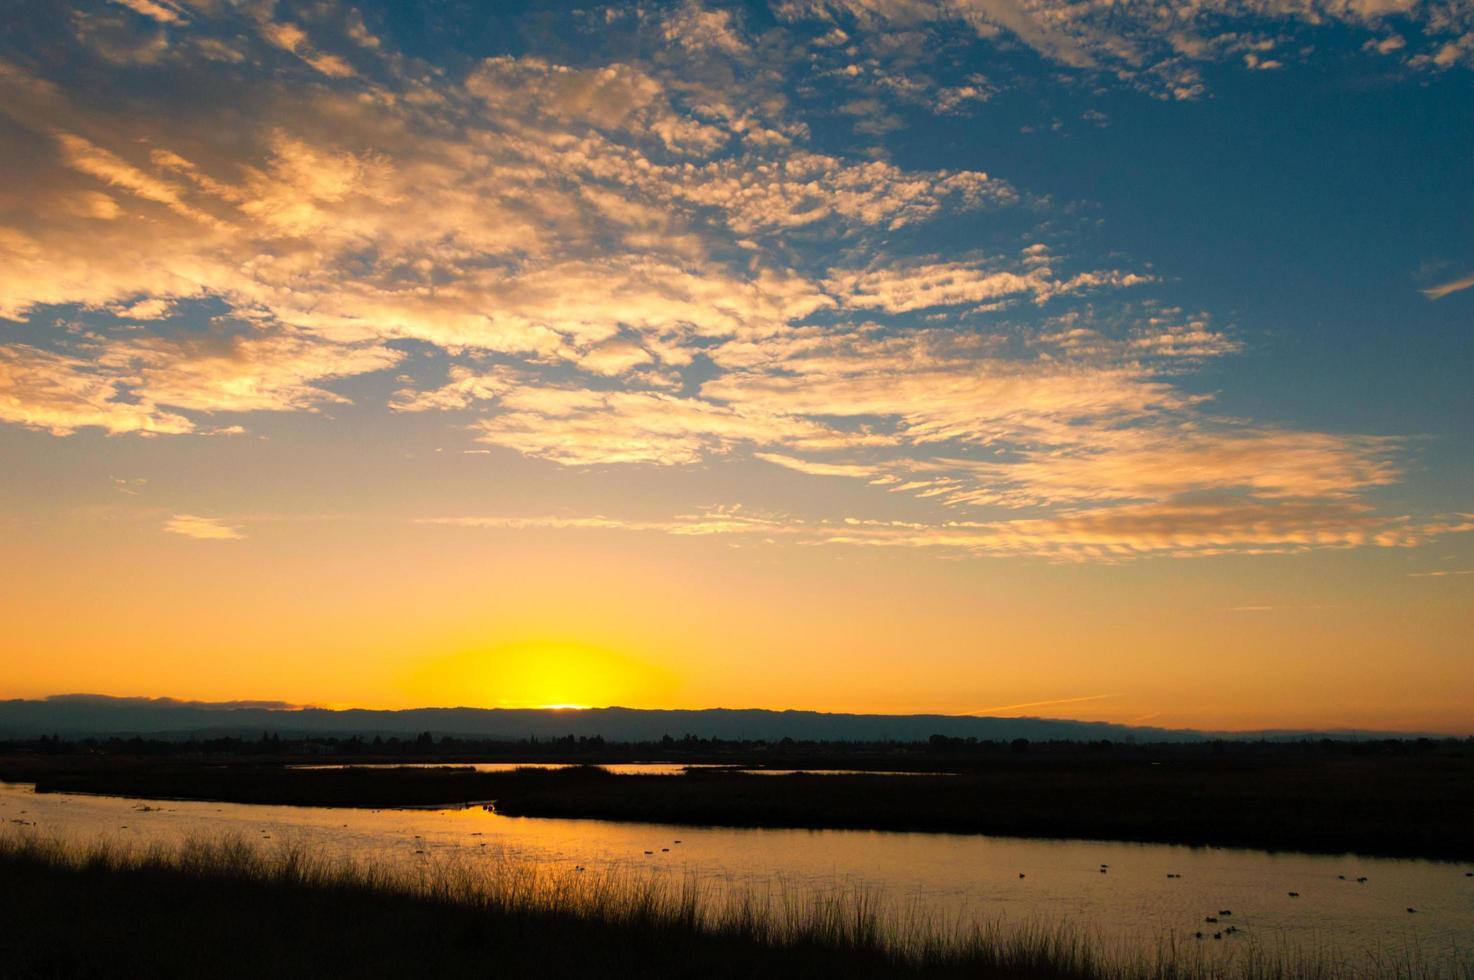 goldener Sonnenuntergangshimmel mit Wolken foto